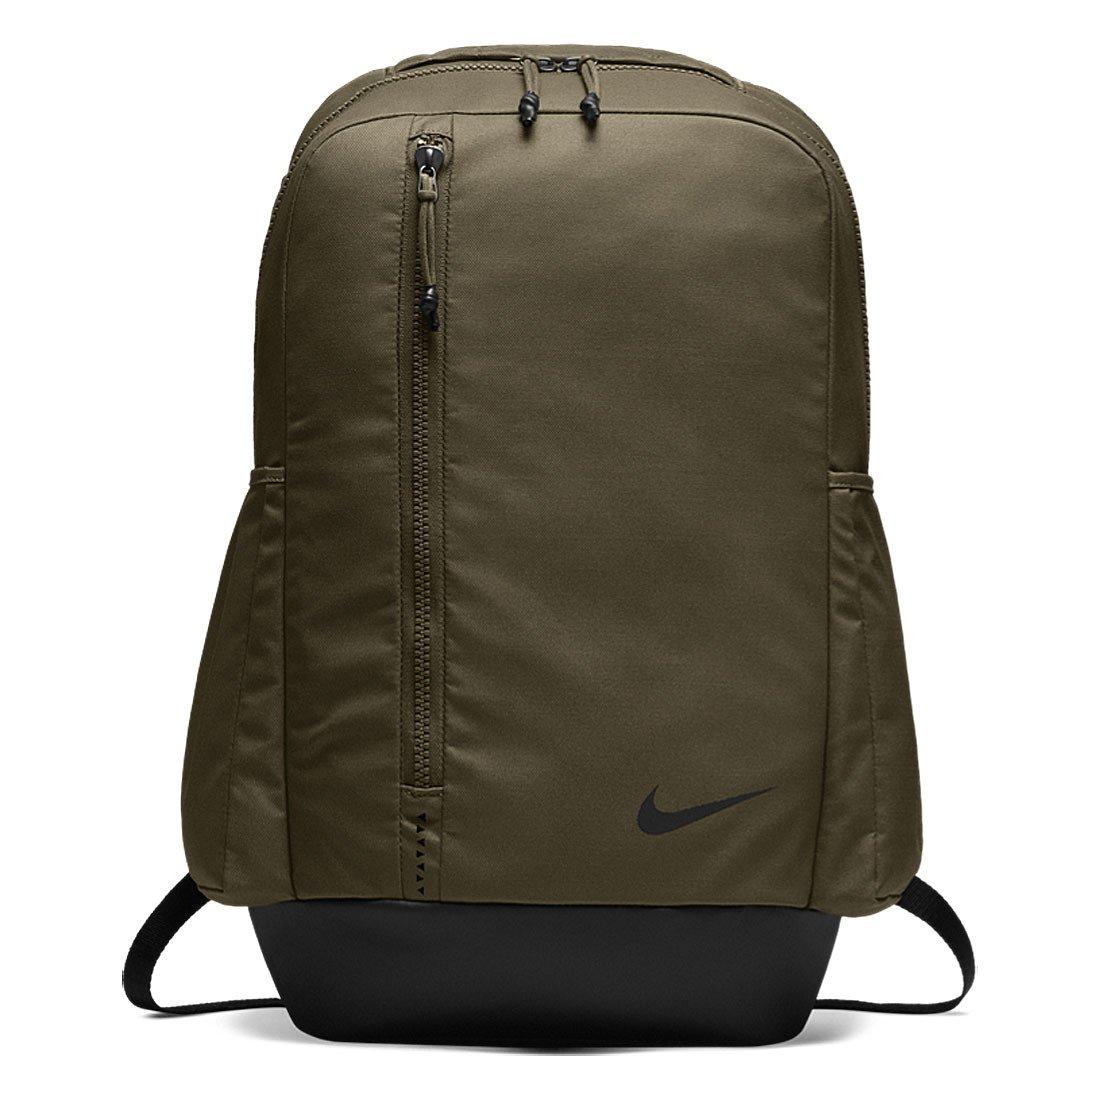 ab339c01f560b Zielony plecak szkolny Nike Vapor Power BA5539-395